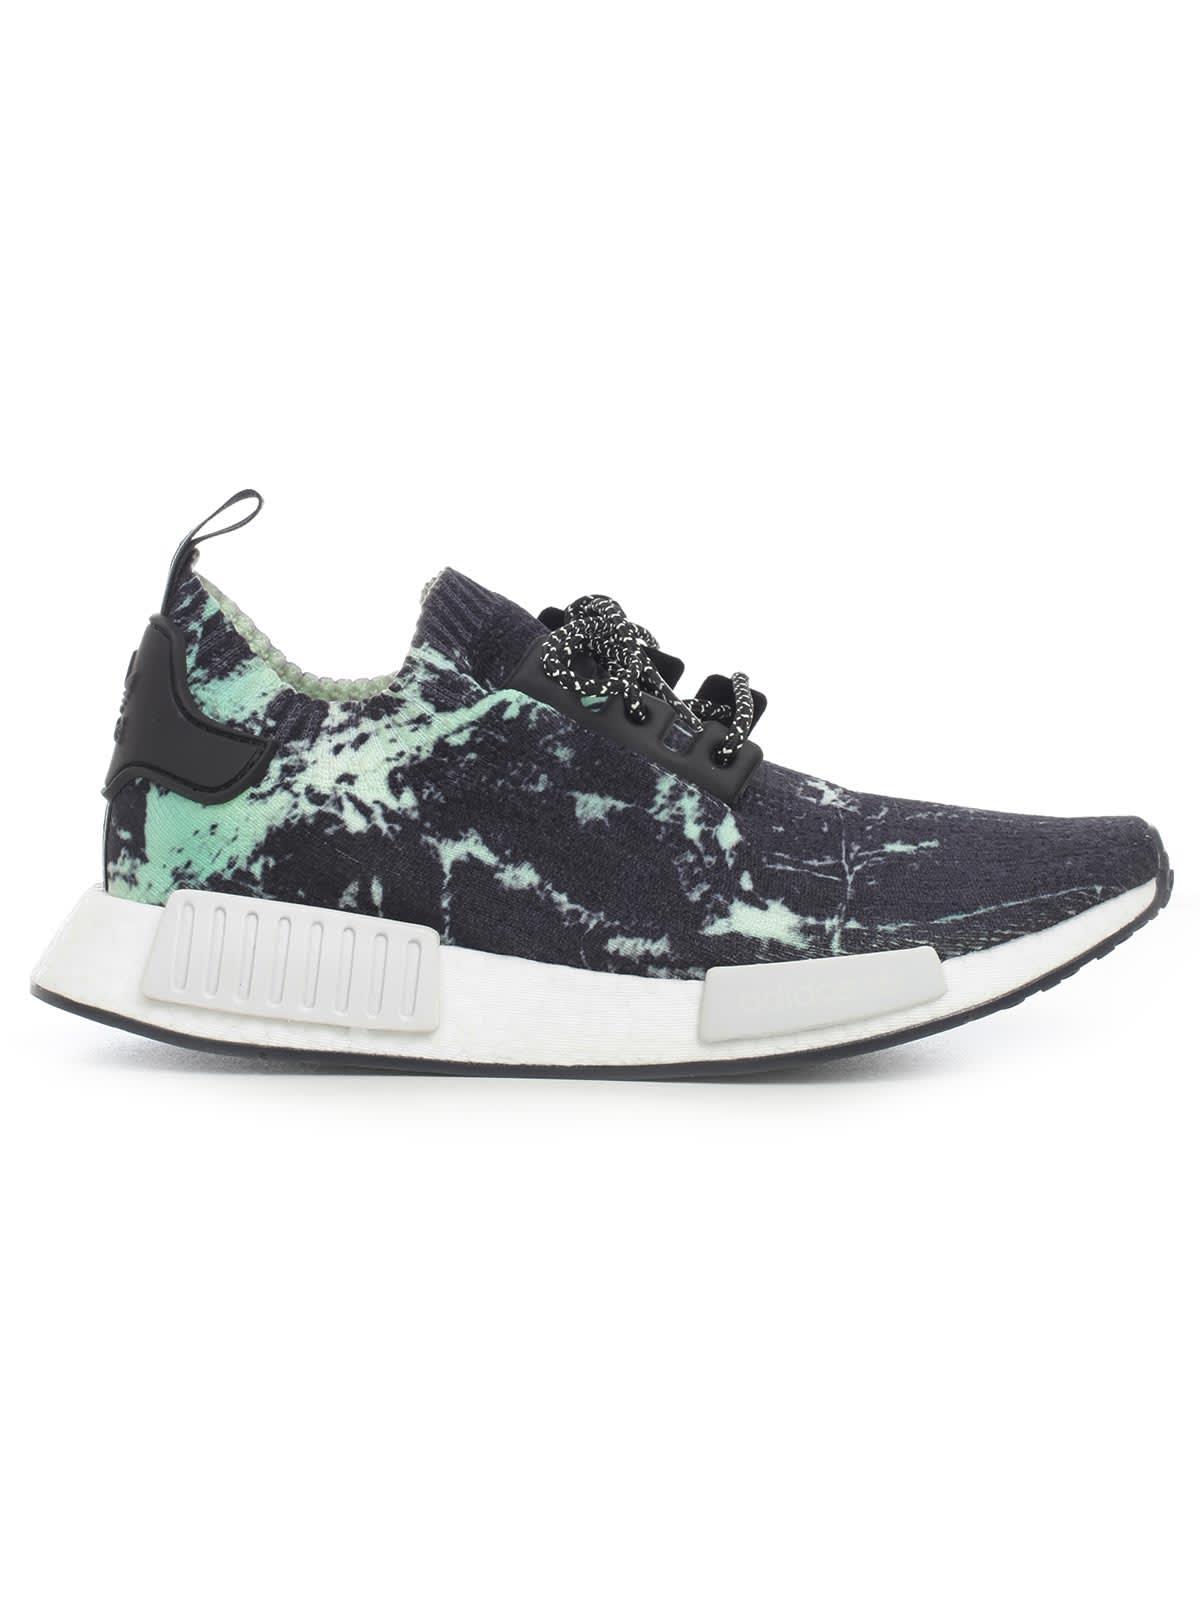 super popular 70134 58313 Adidas Originals Nmd R1 Sneakers